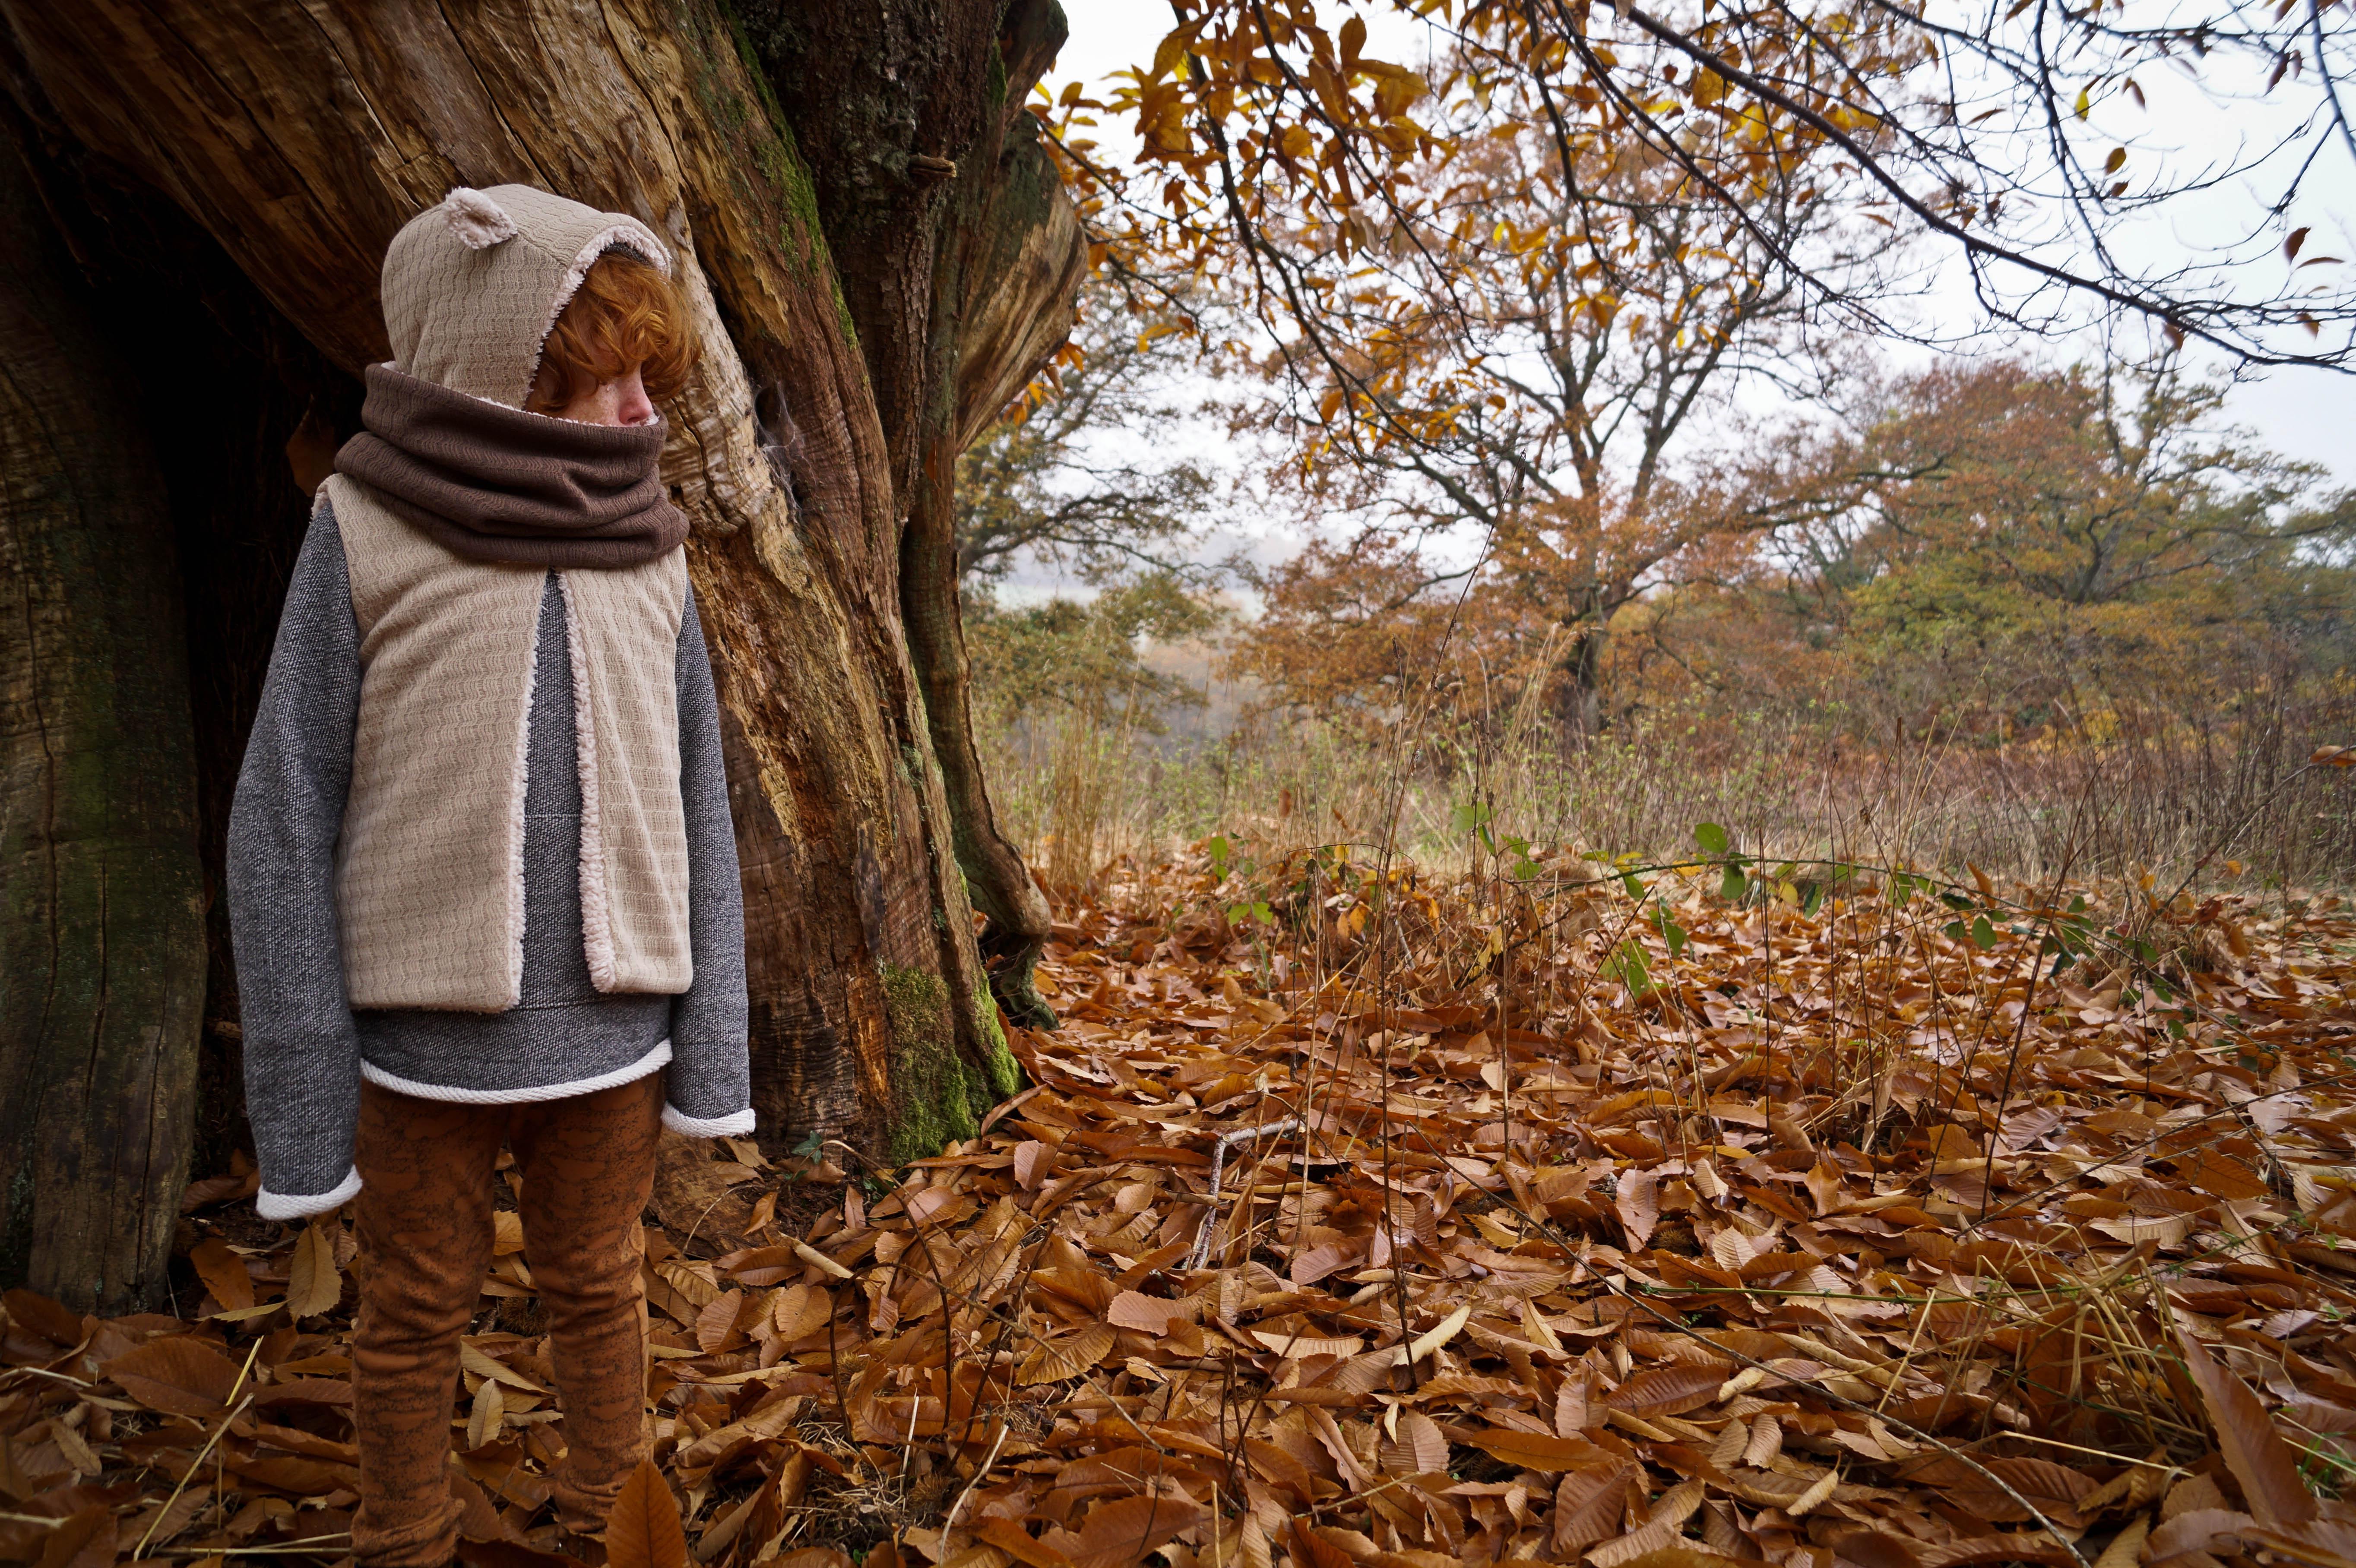 Shooting automne Minabulle garçon raleur wood